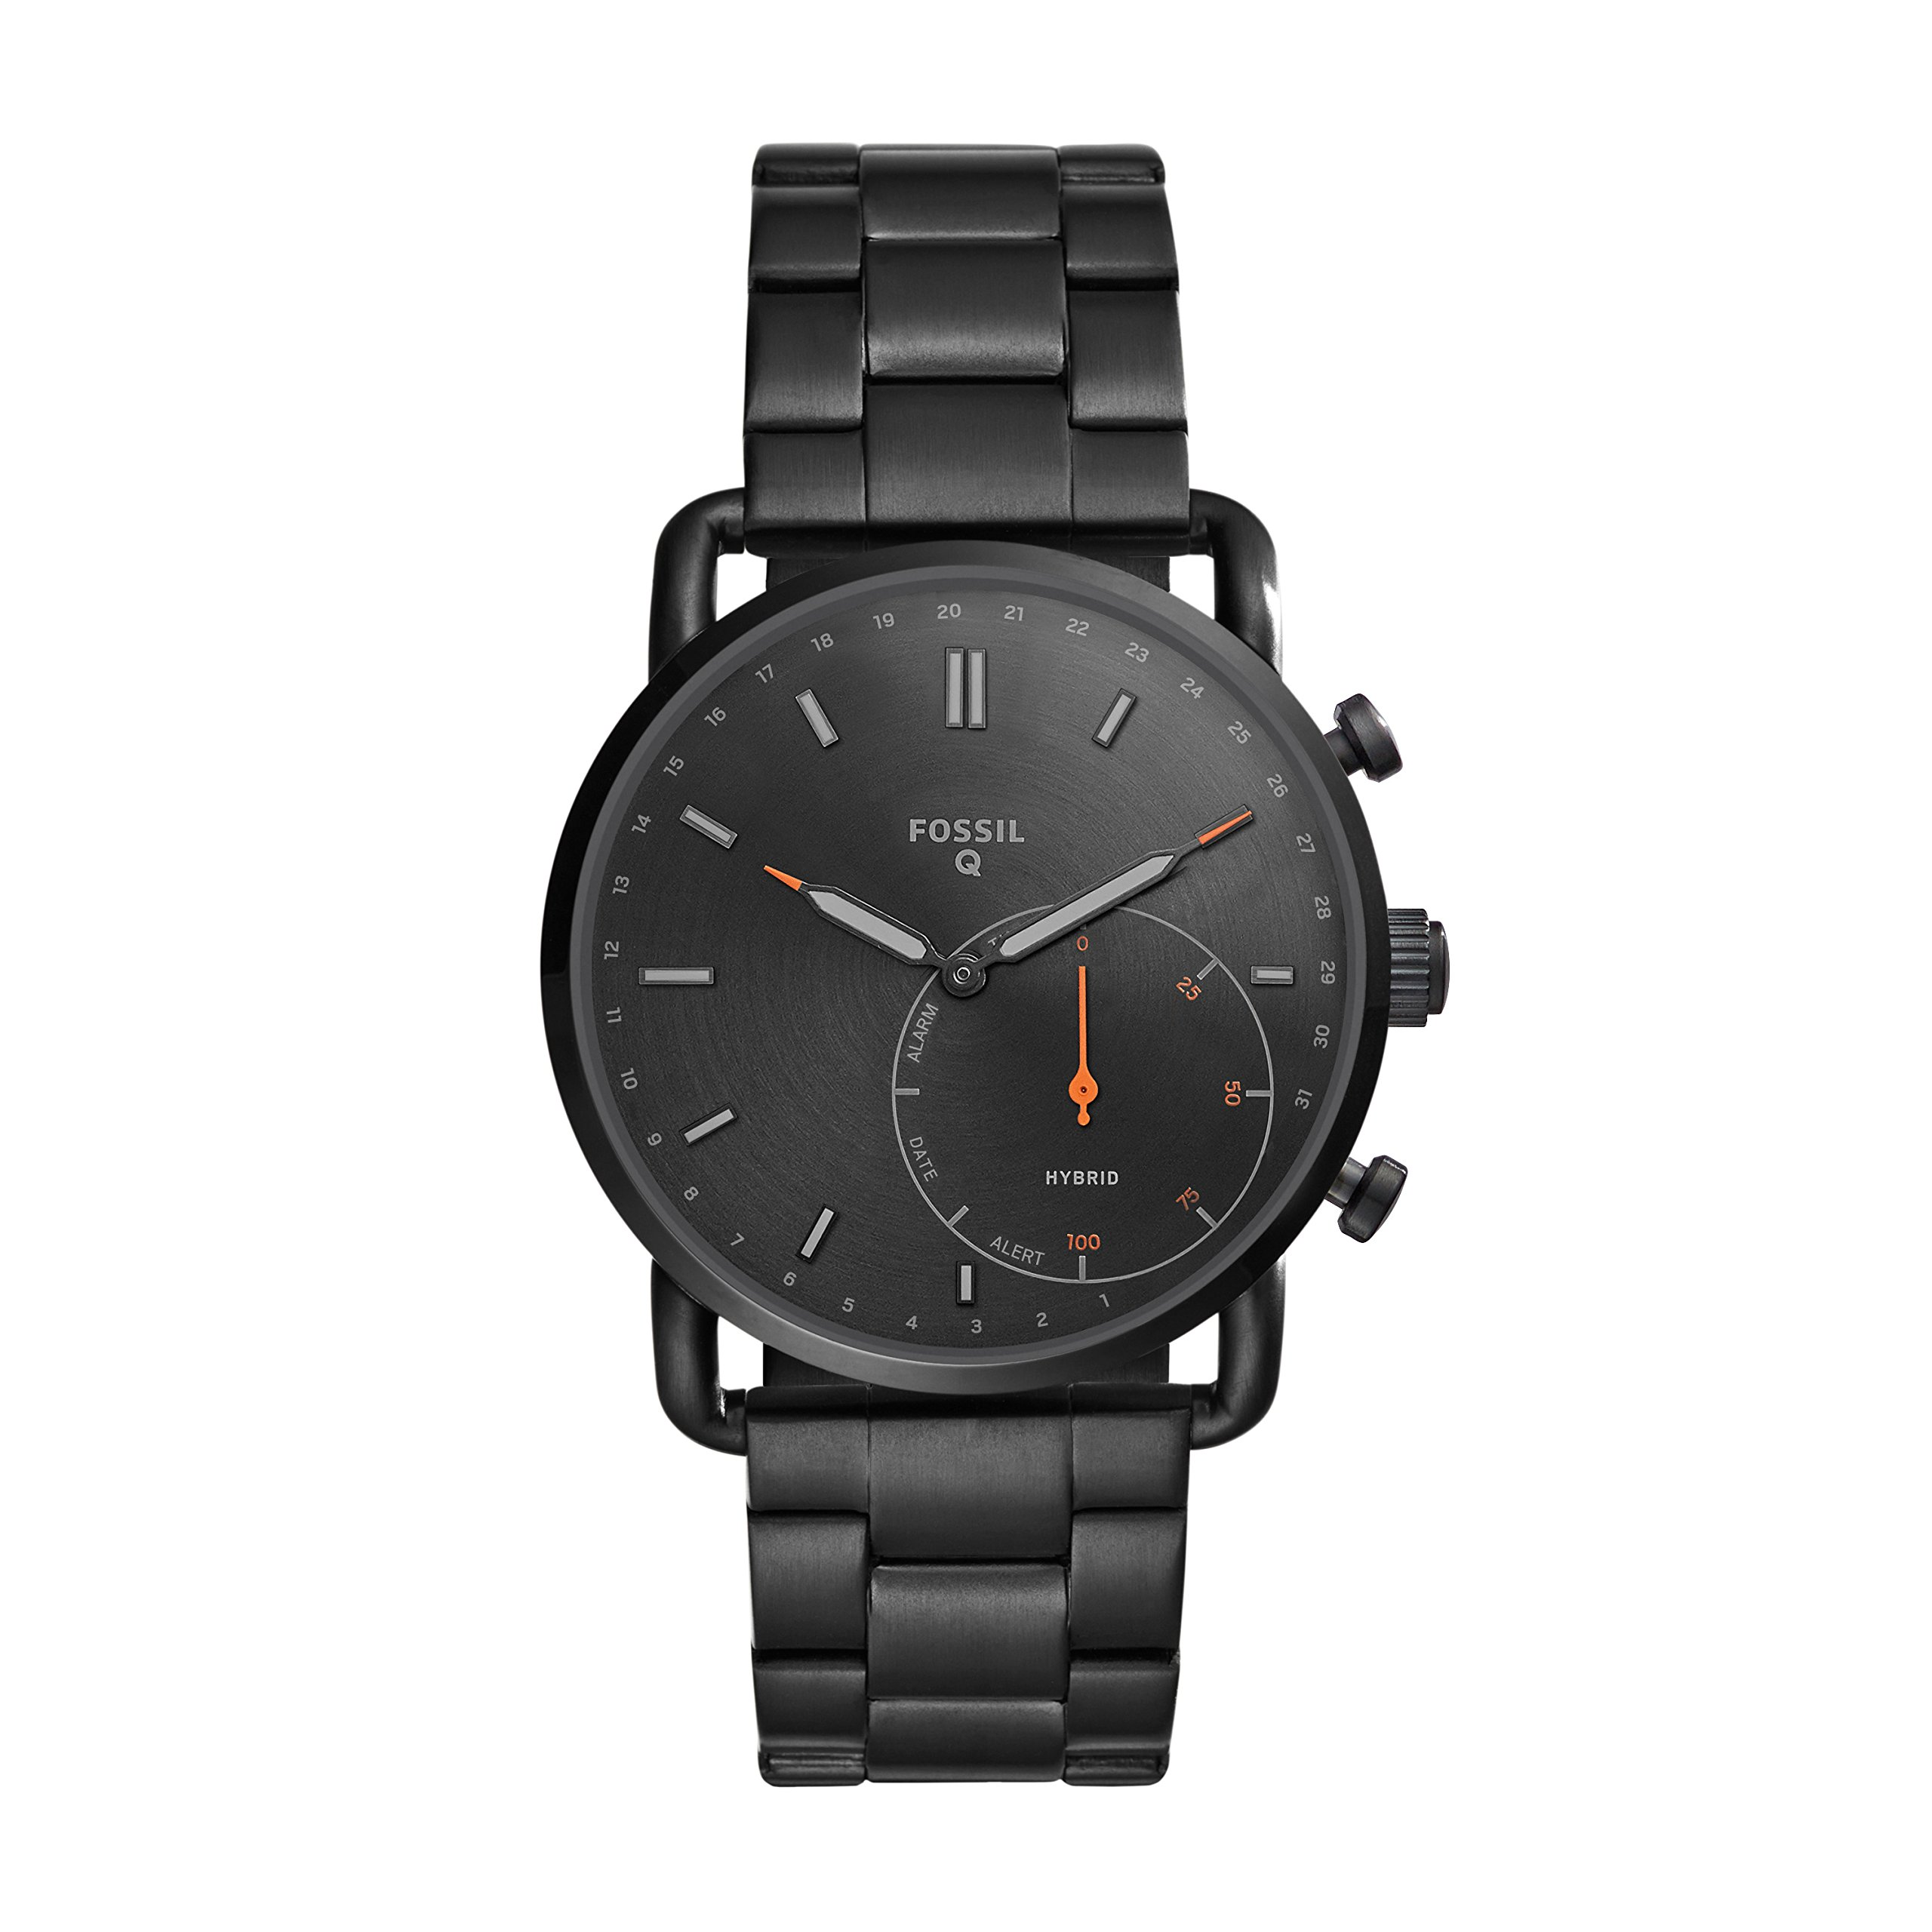   Fossil Hybrid Smartwatch - Q Commuter Black Stainless Steel FTW1148